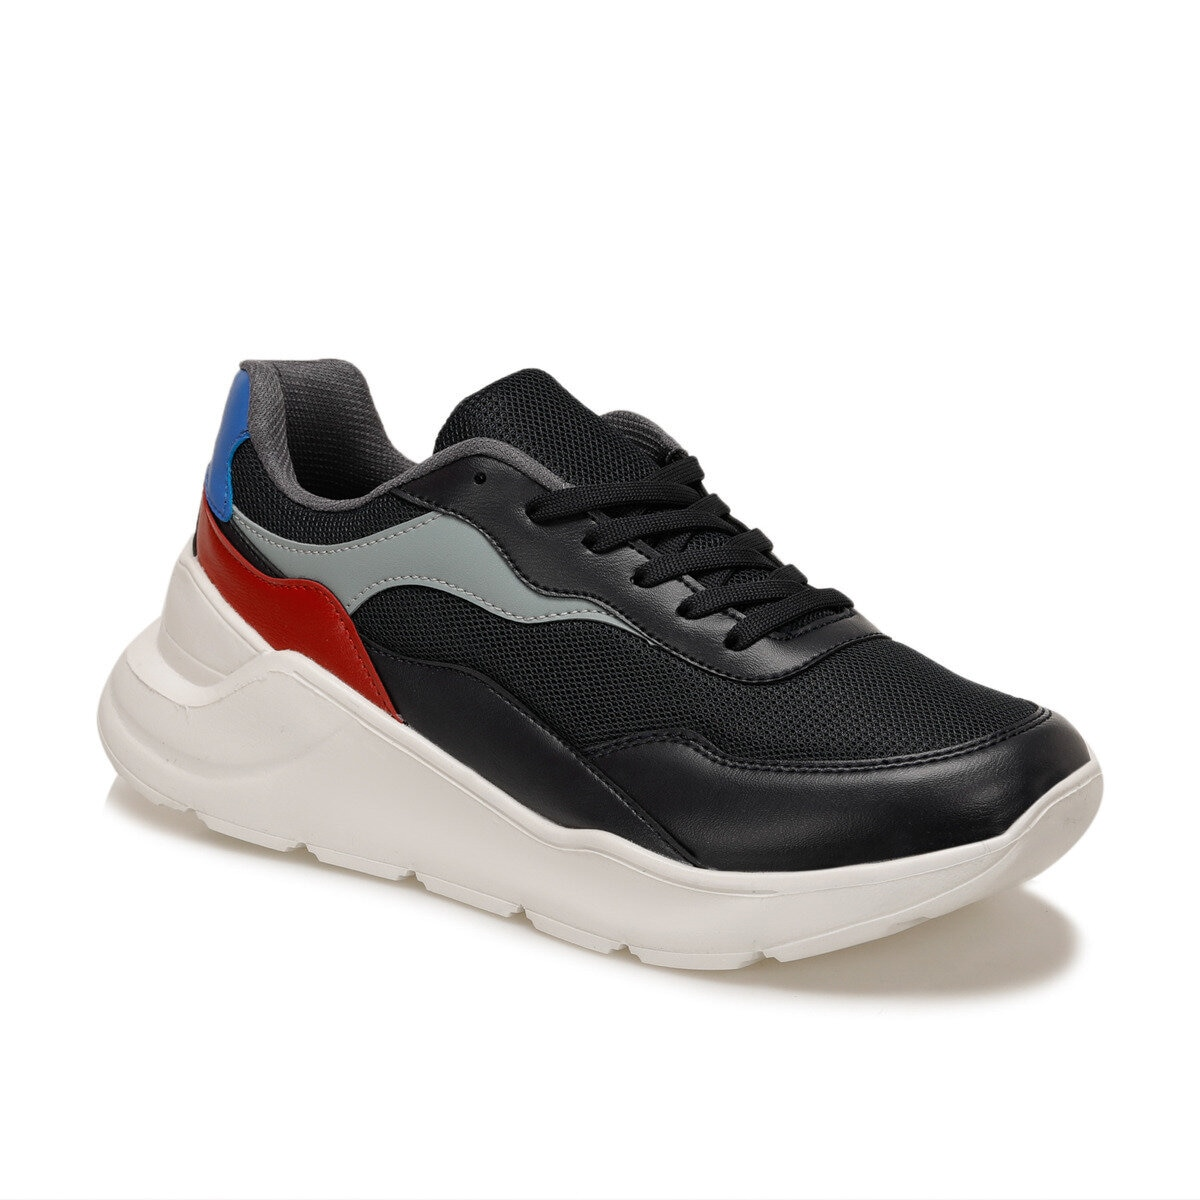 FLO BORYA Navy Blue Men 'S Sneaker Shoes Torex